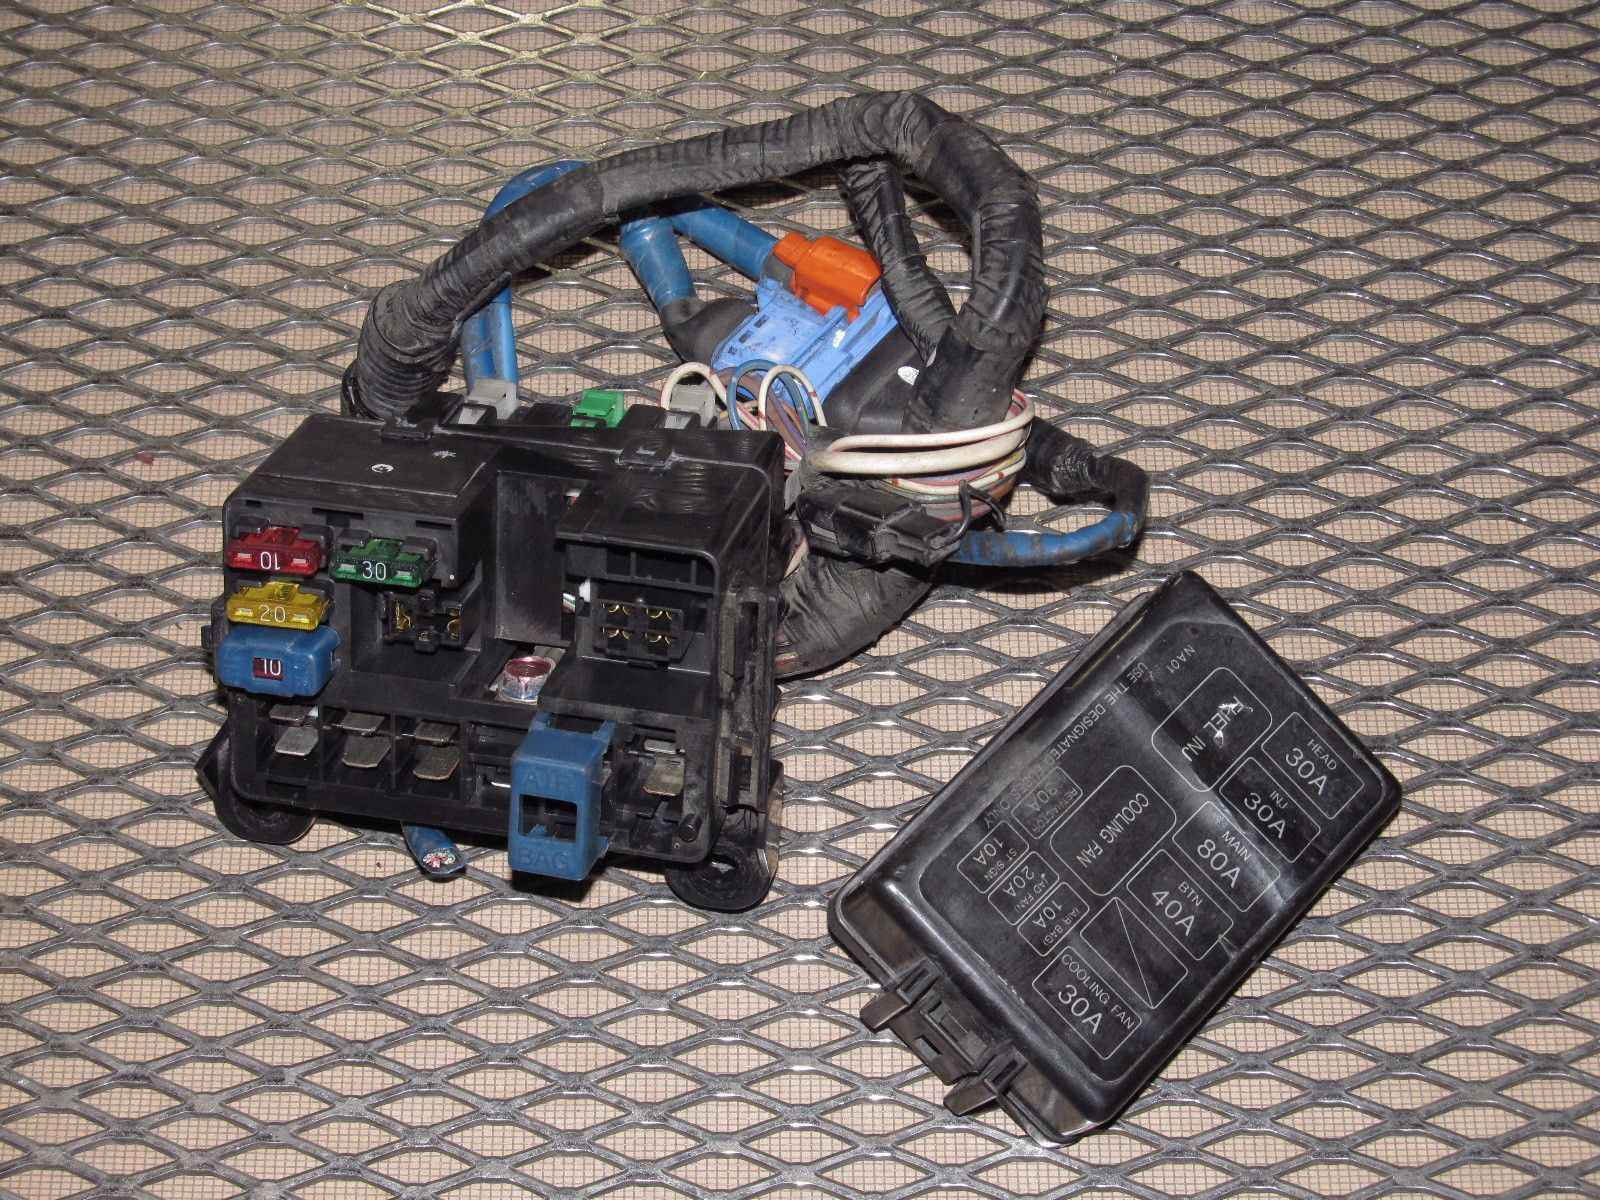 mazda miata 5 fuse box diagram wiring library90 91 92 93 mazda miata oem engine fuse [ 1600 x 1200 Pixel ]